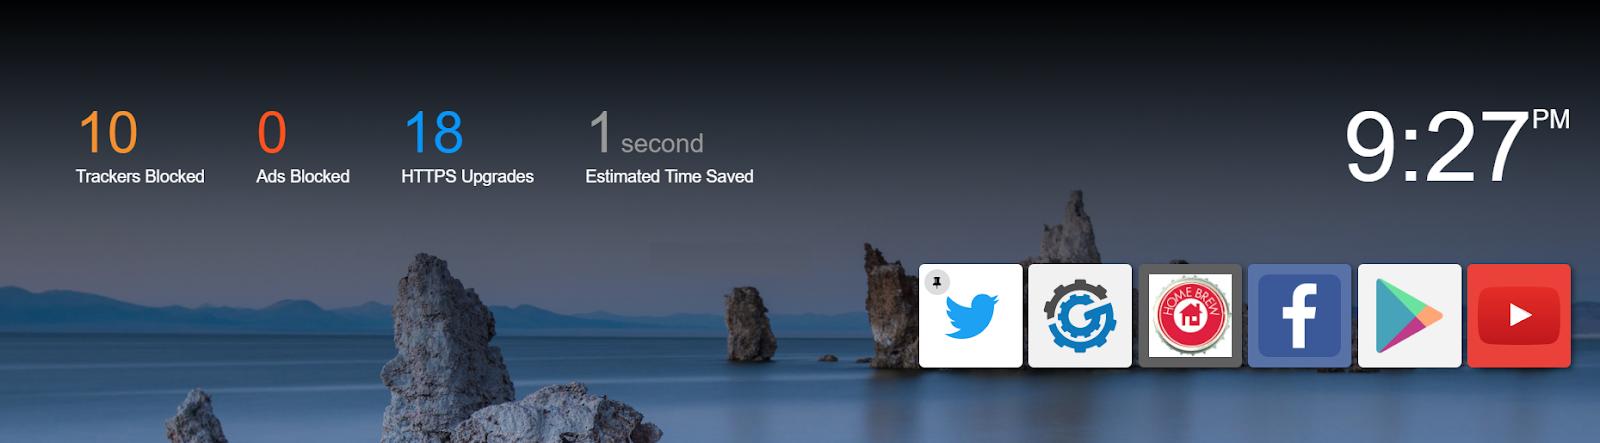 Brave, ο νέος browser που υποστηρίζει torrent και streaming 1